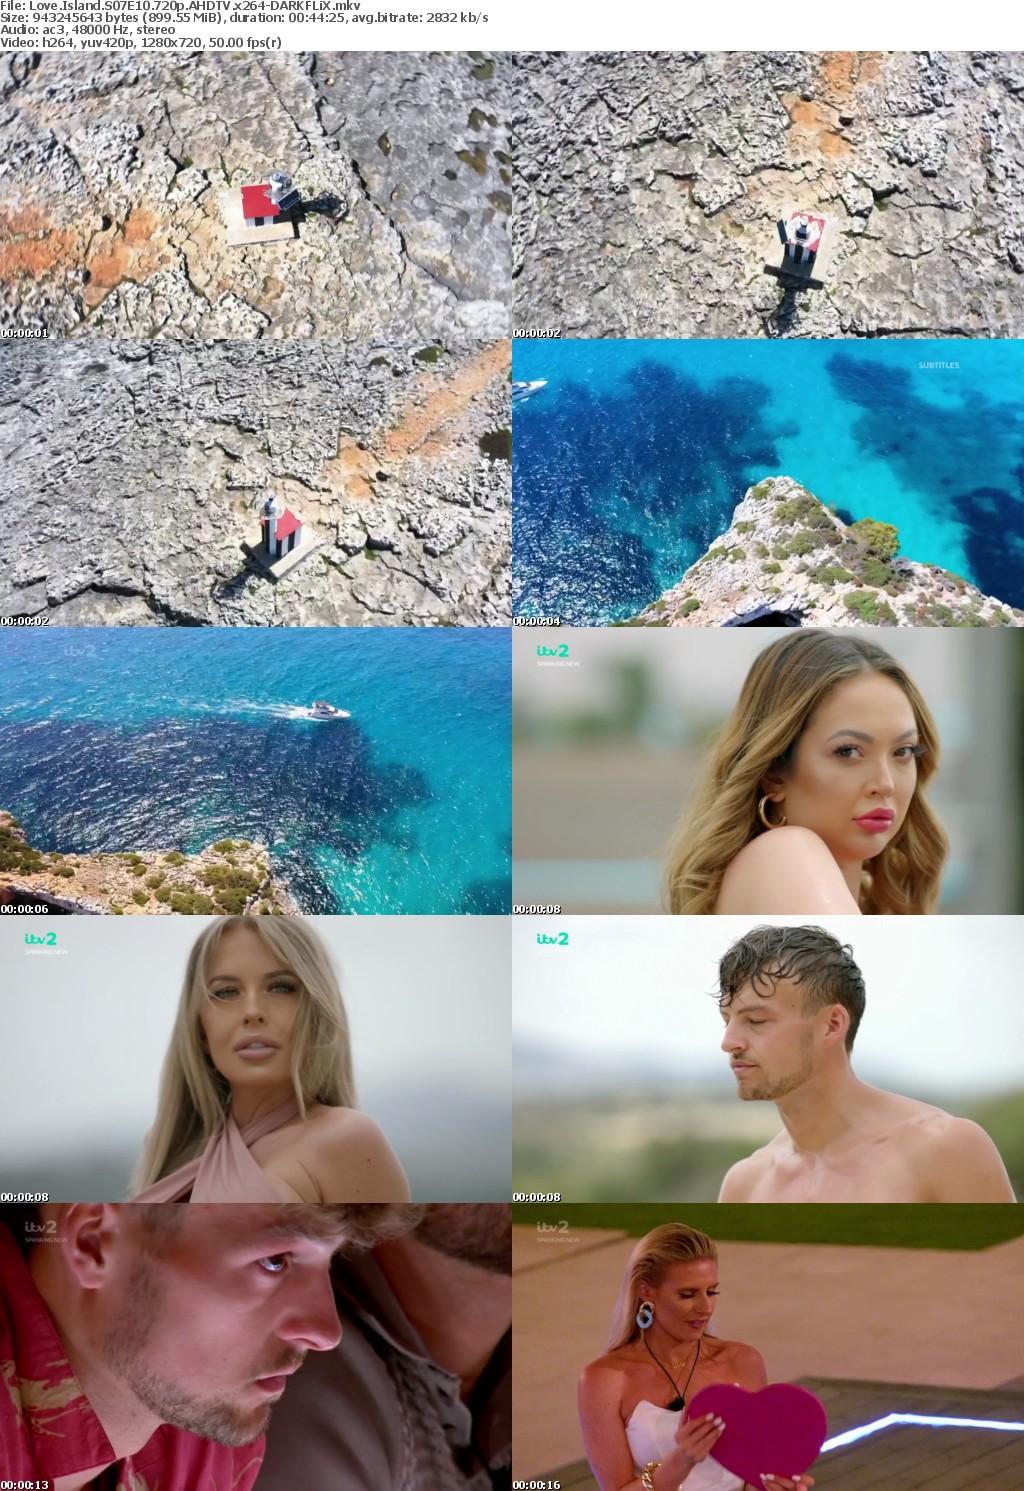 Love Island S07E10 720p AHDTV x264-DARKFLiX